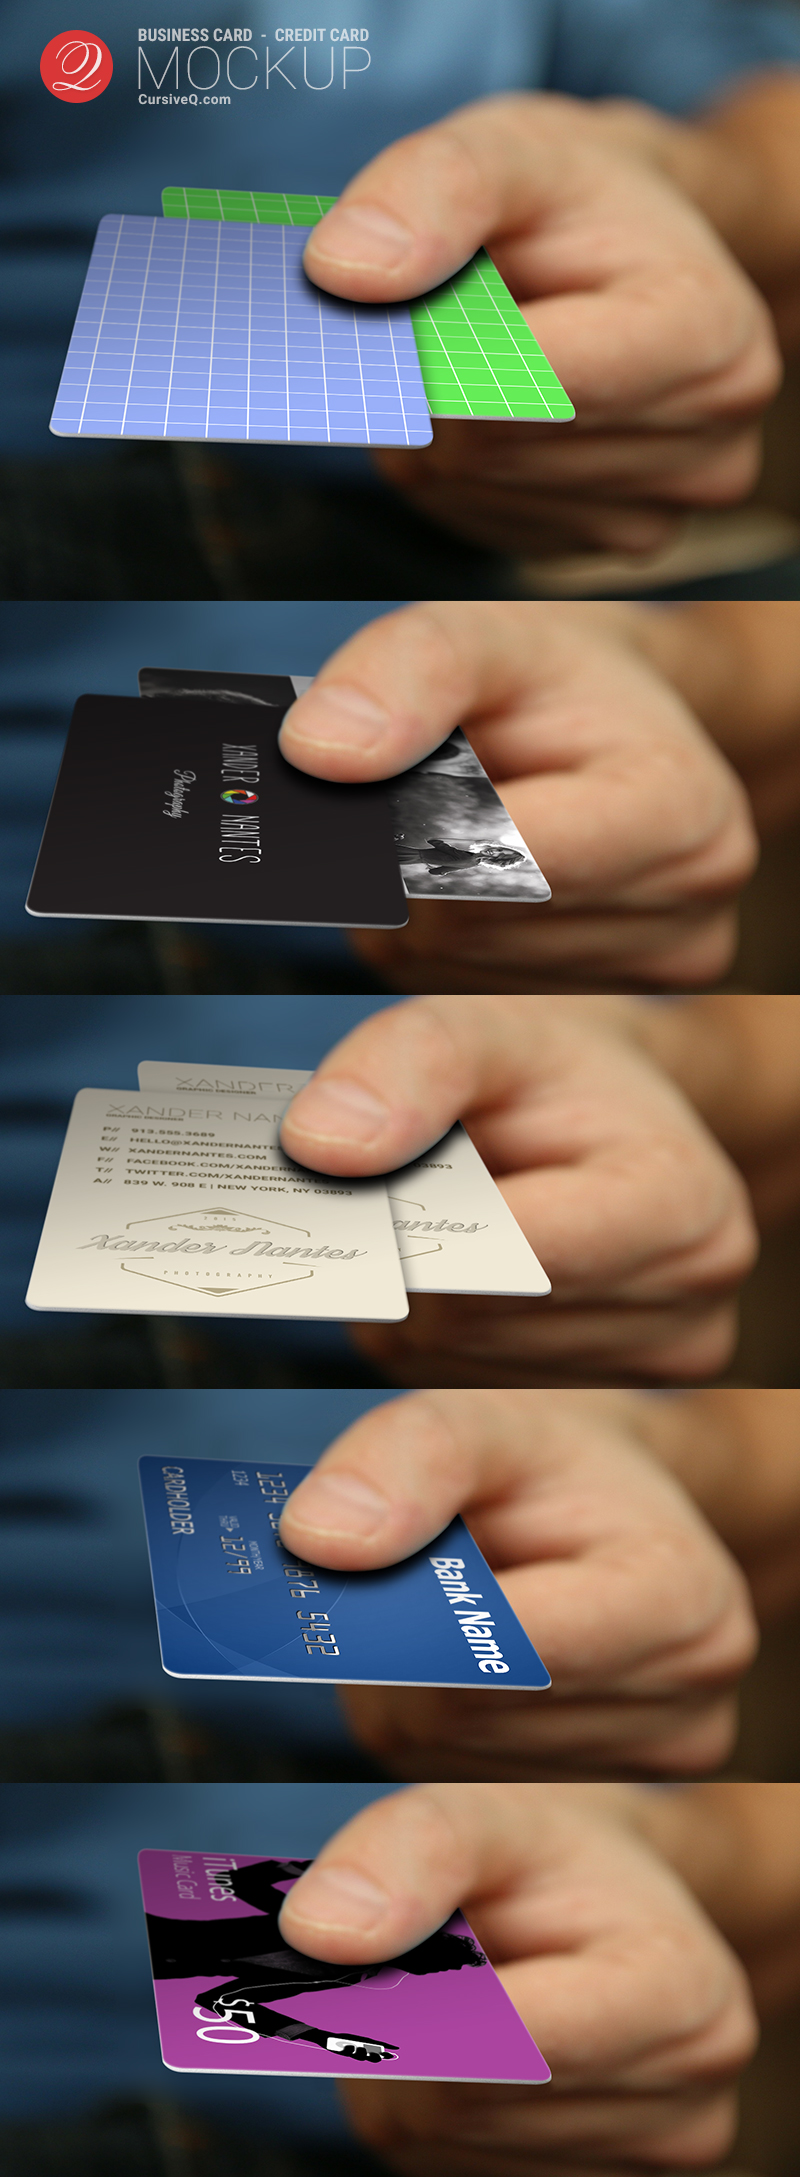 Free Business Card, Credit Card, Hand Mockup